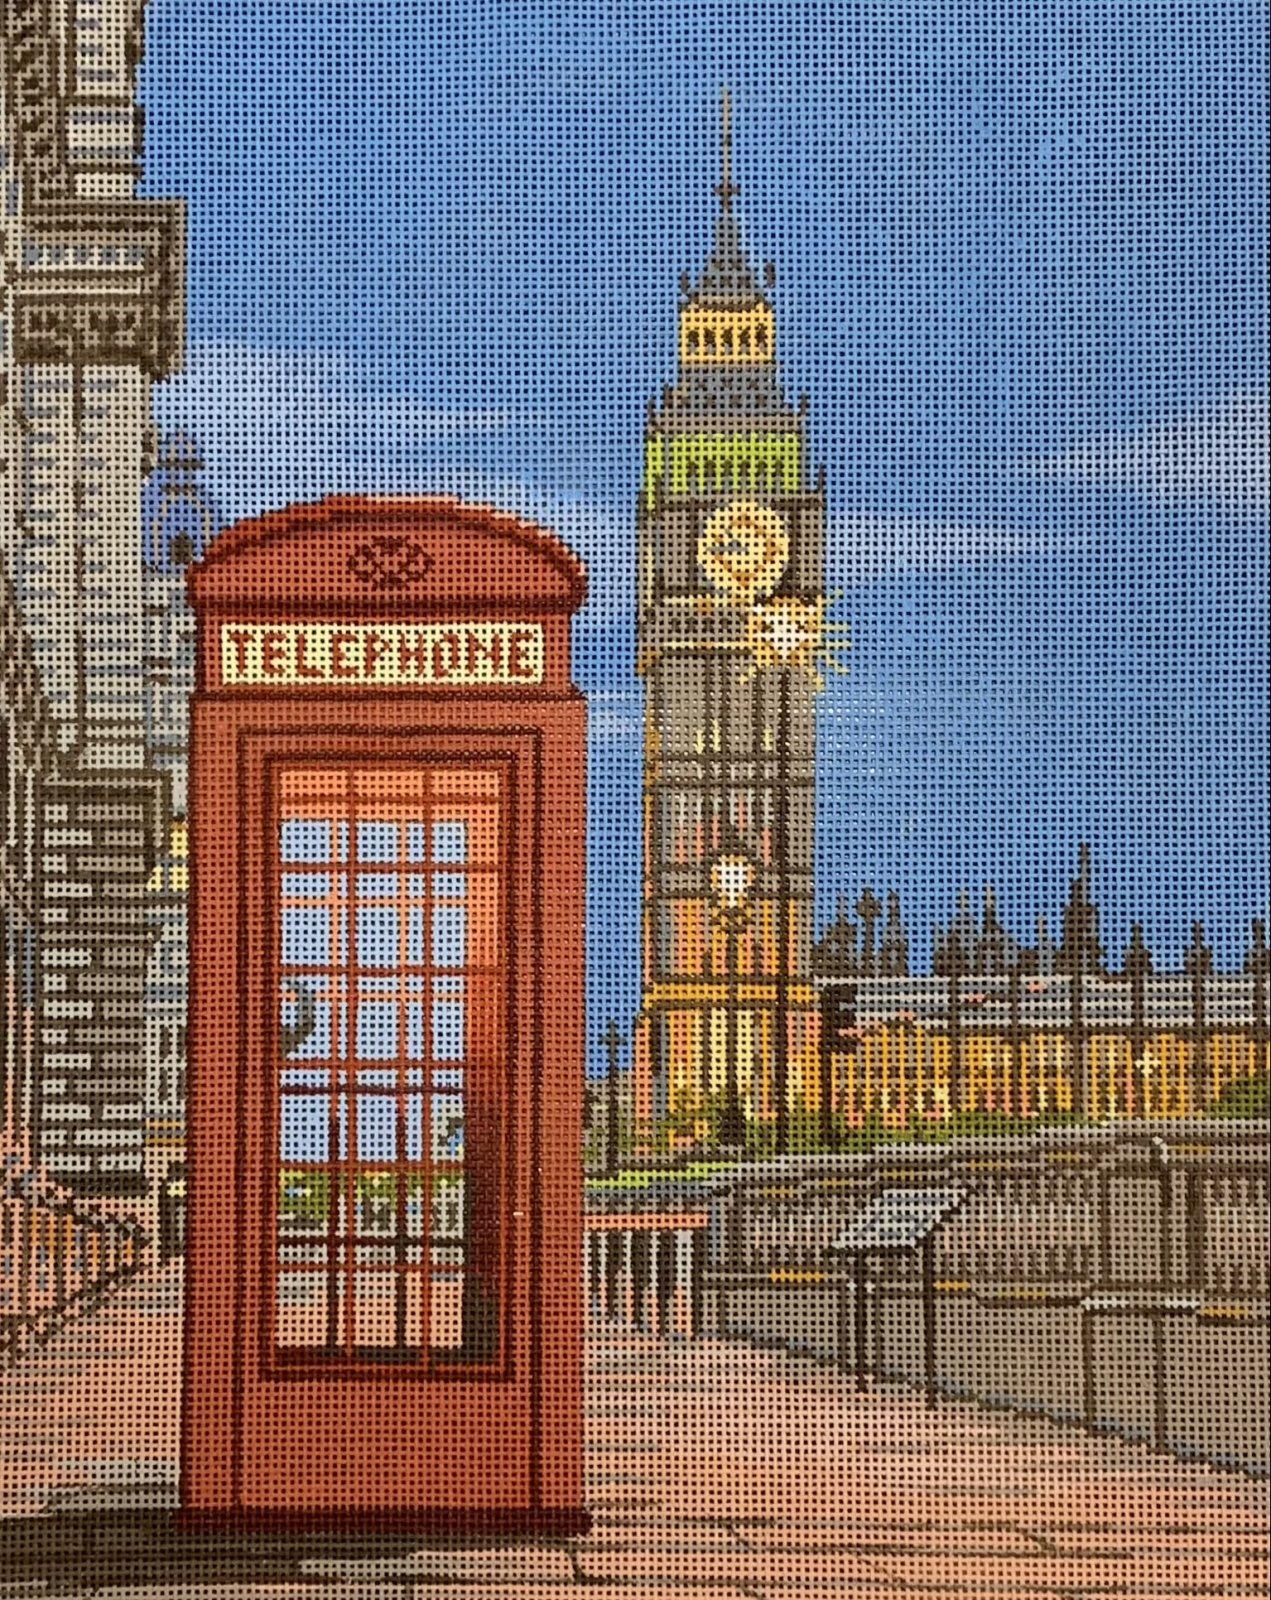 London England Street Scene